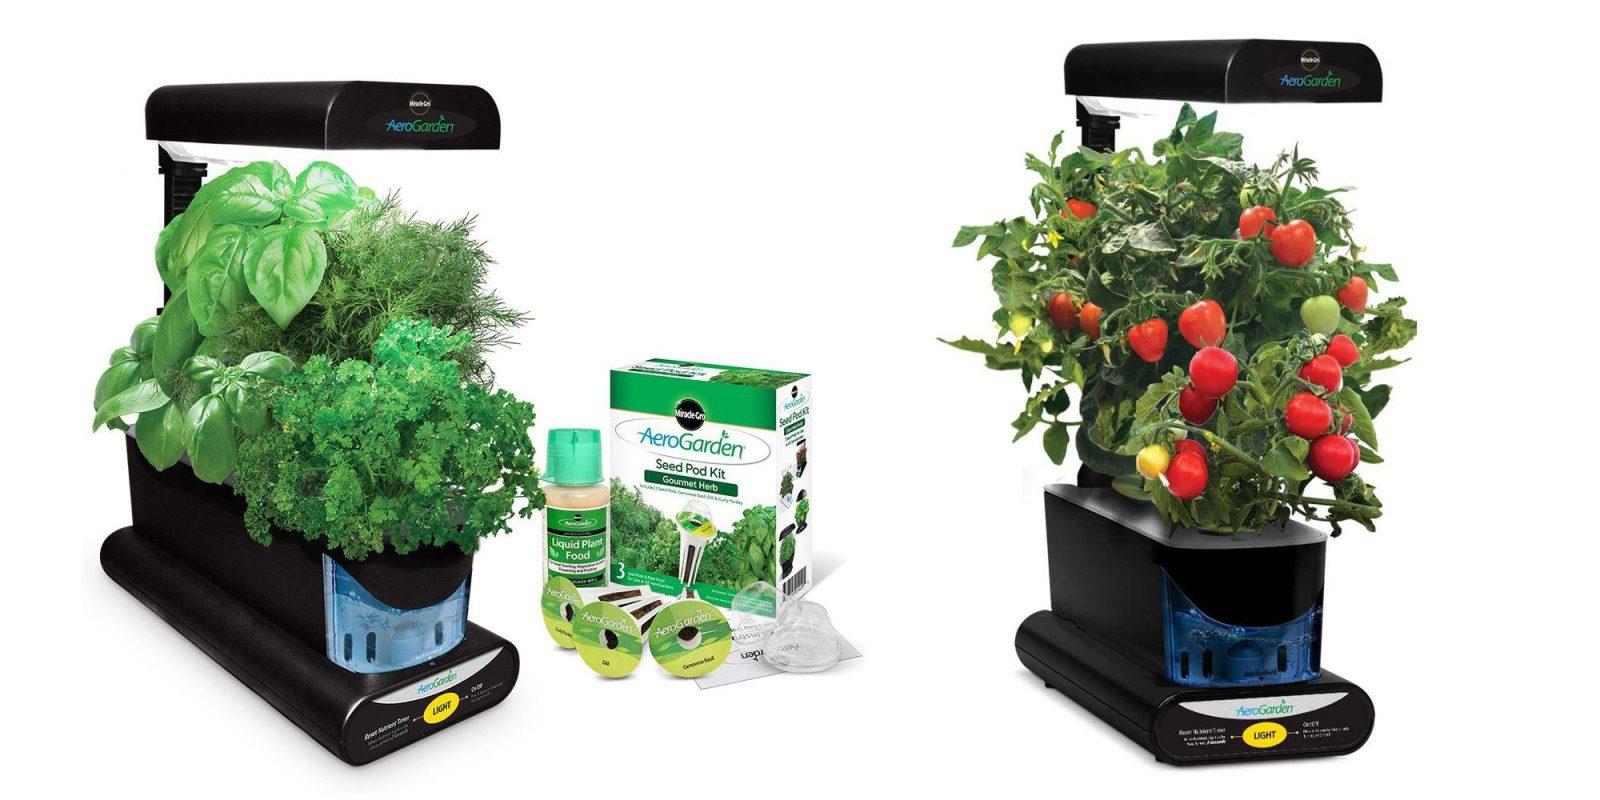 Green Deals: Miracle-Gro AeroGarden w/ Herb Kit $50 (Reg